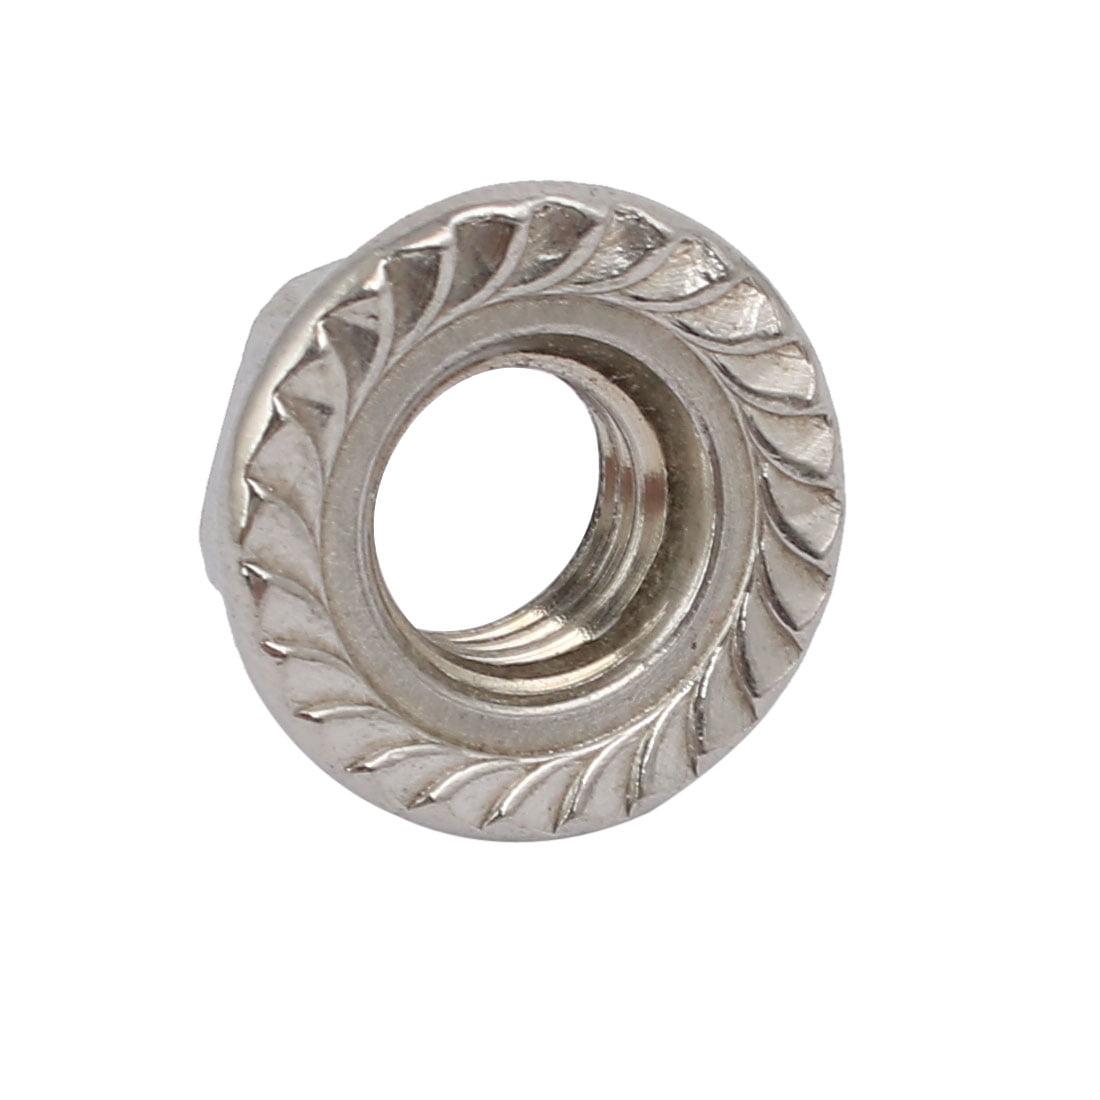 45 6.0710 in OD Timken National Seals 6635S 0.6250 in Width 45 Design Nitrile Oil Seal 4.3750 in Shaft Nitrile Single Lip with Spring